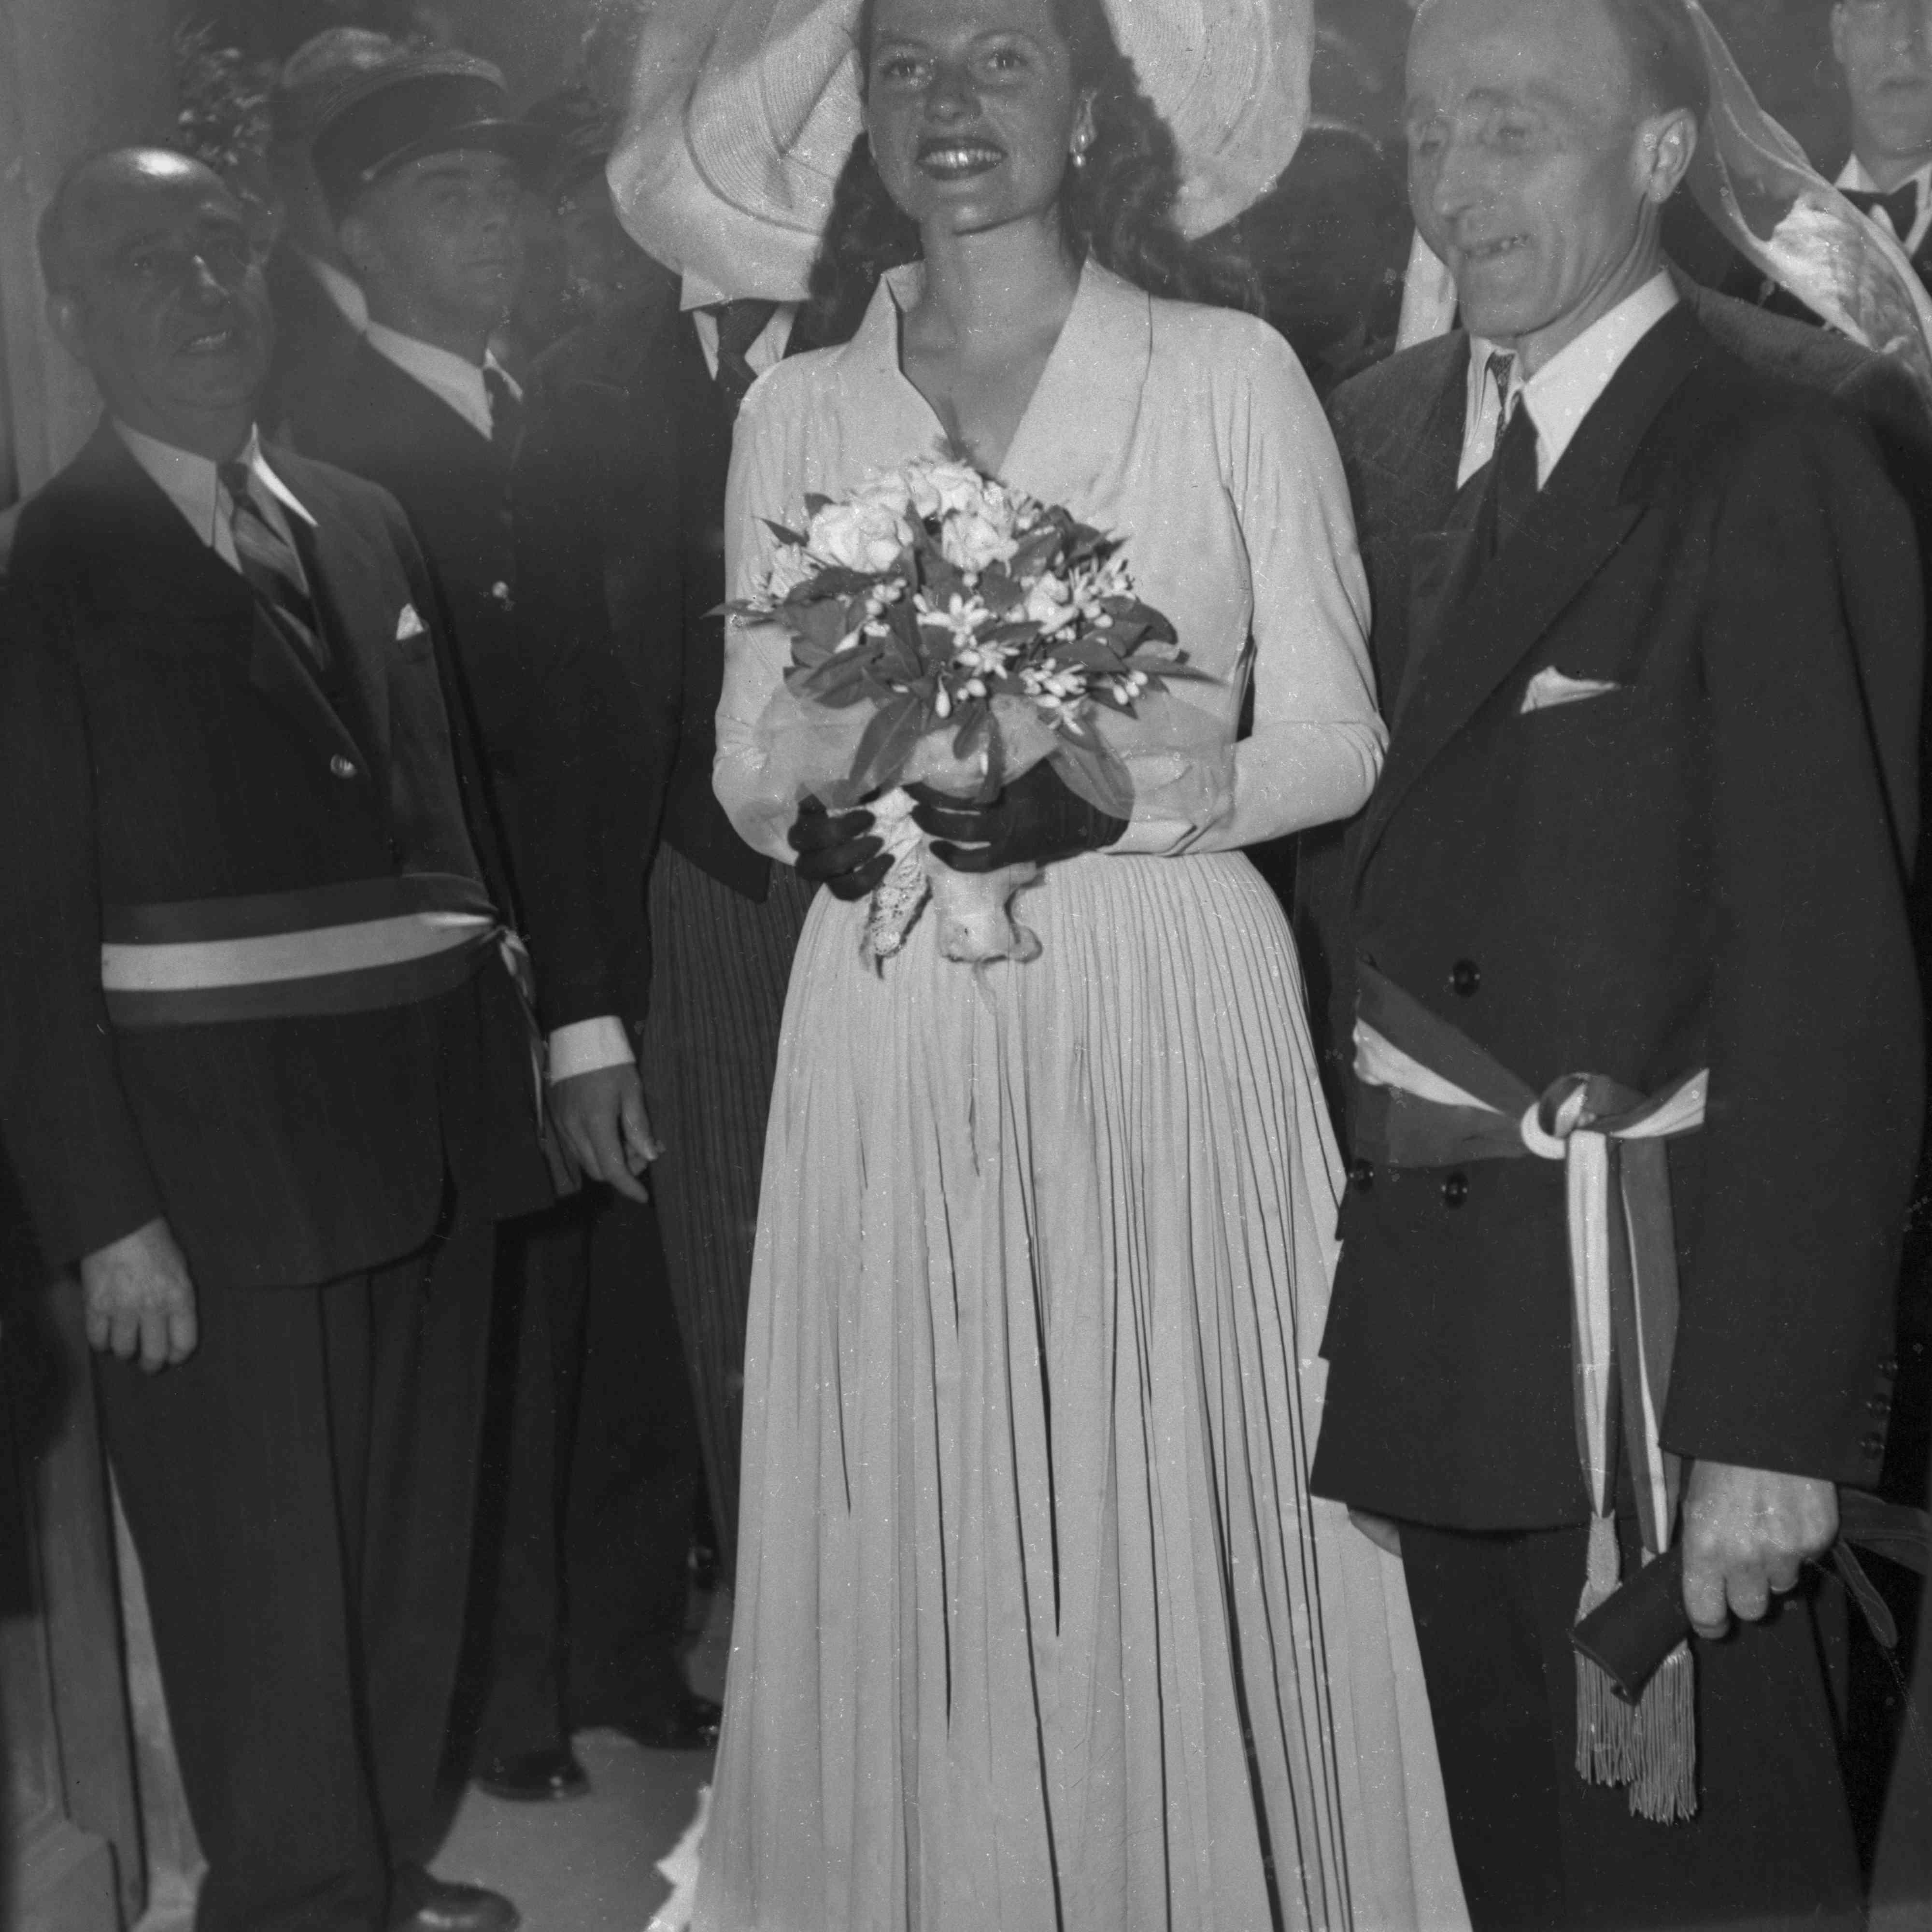 Rita Hayworth at her wedding